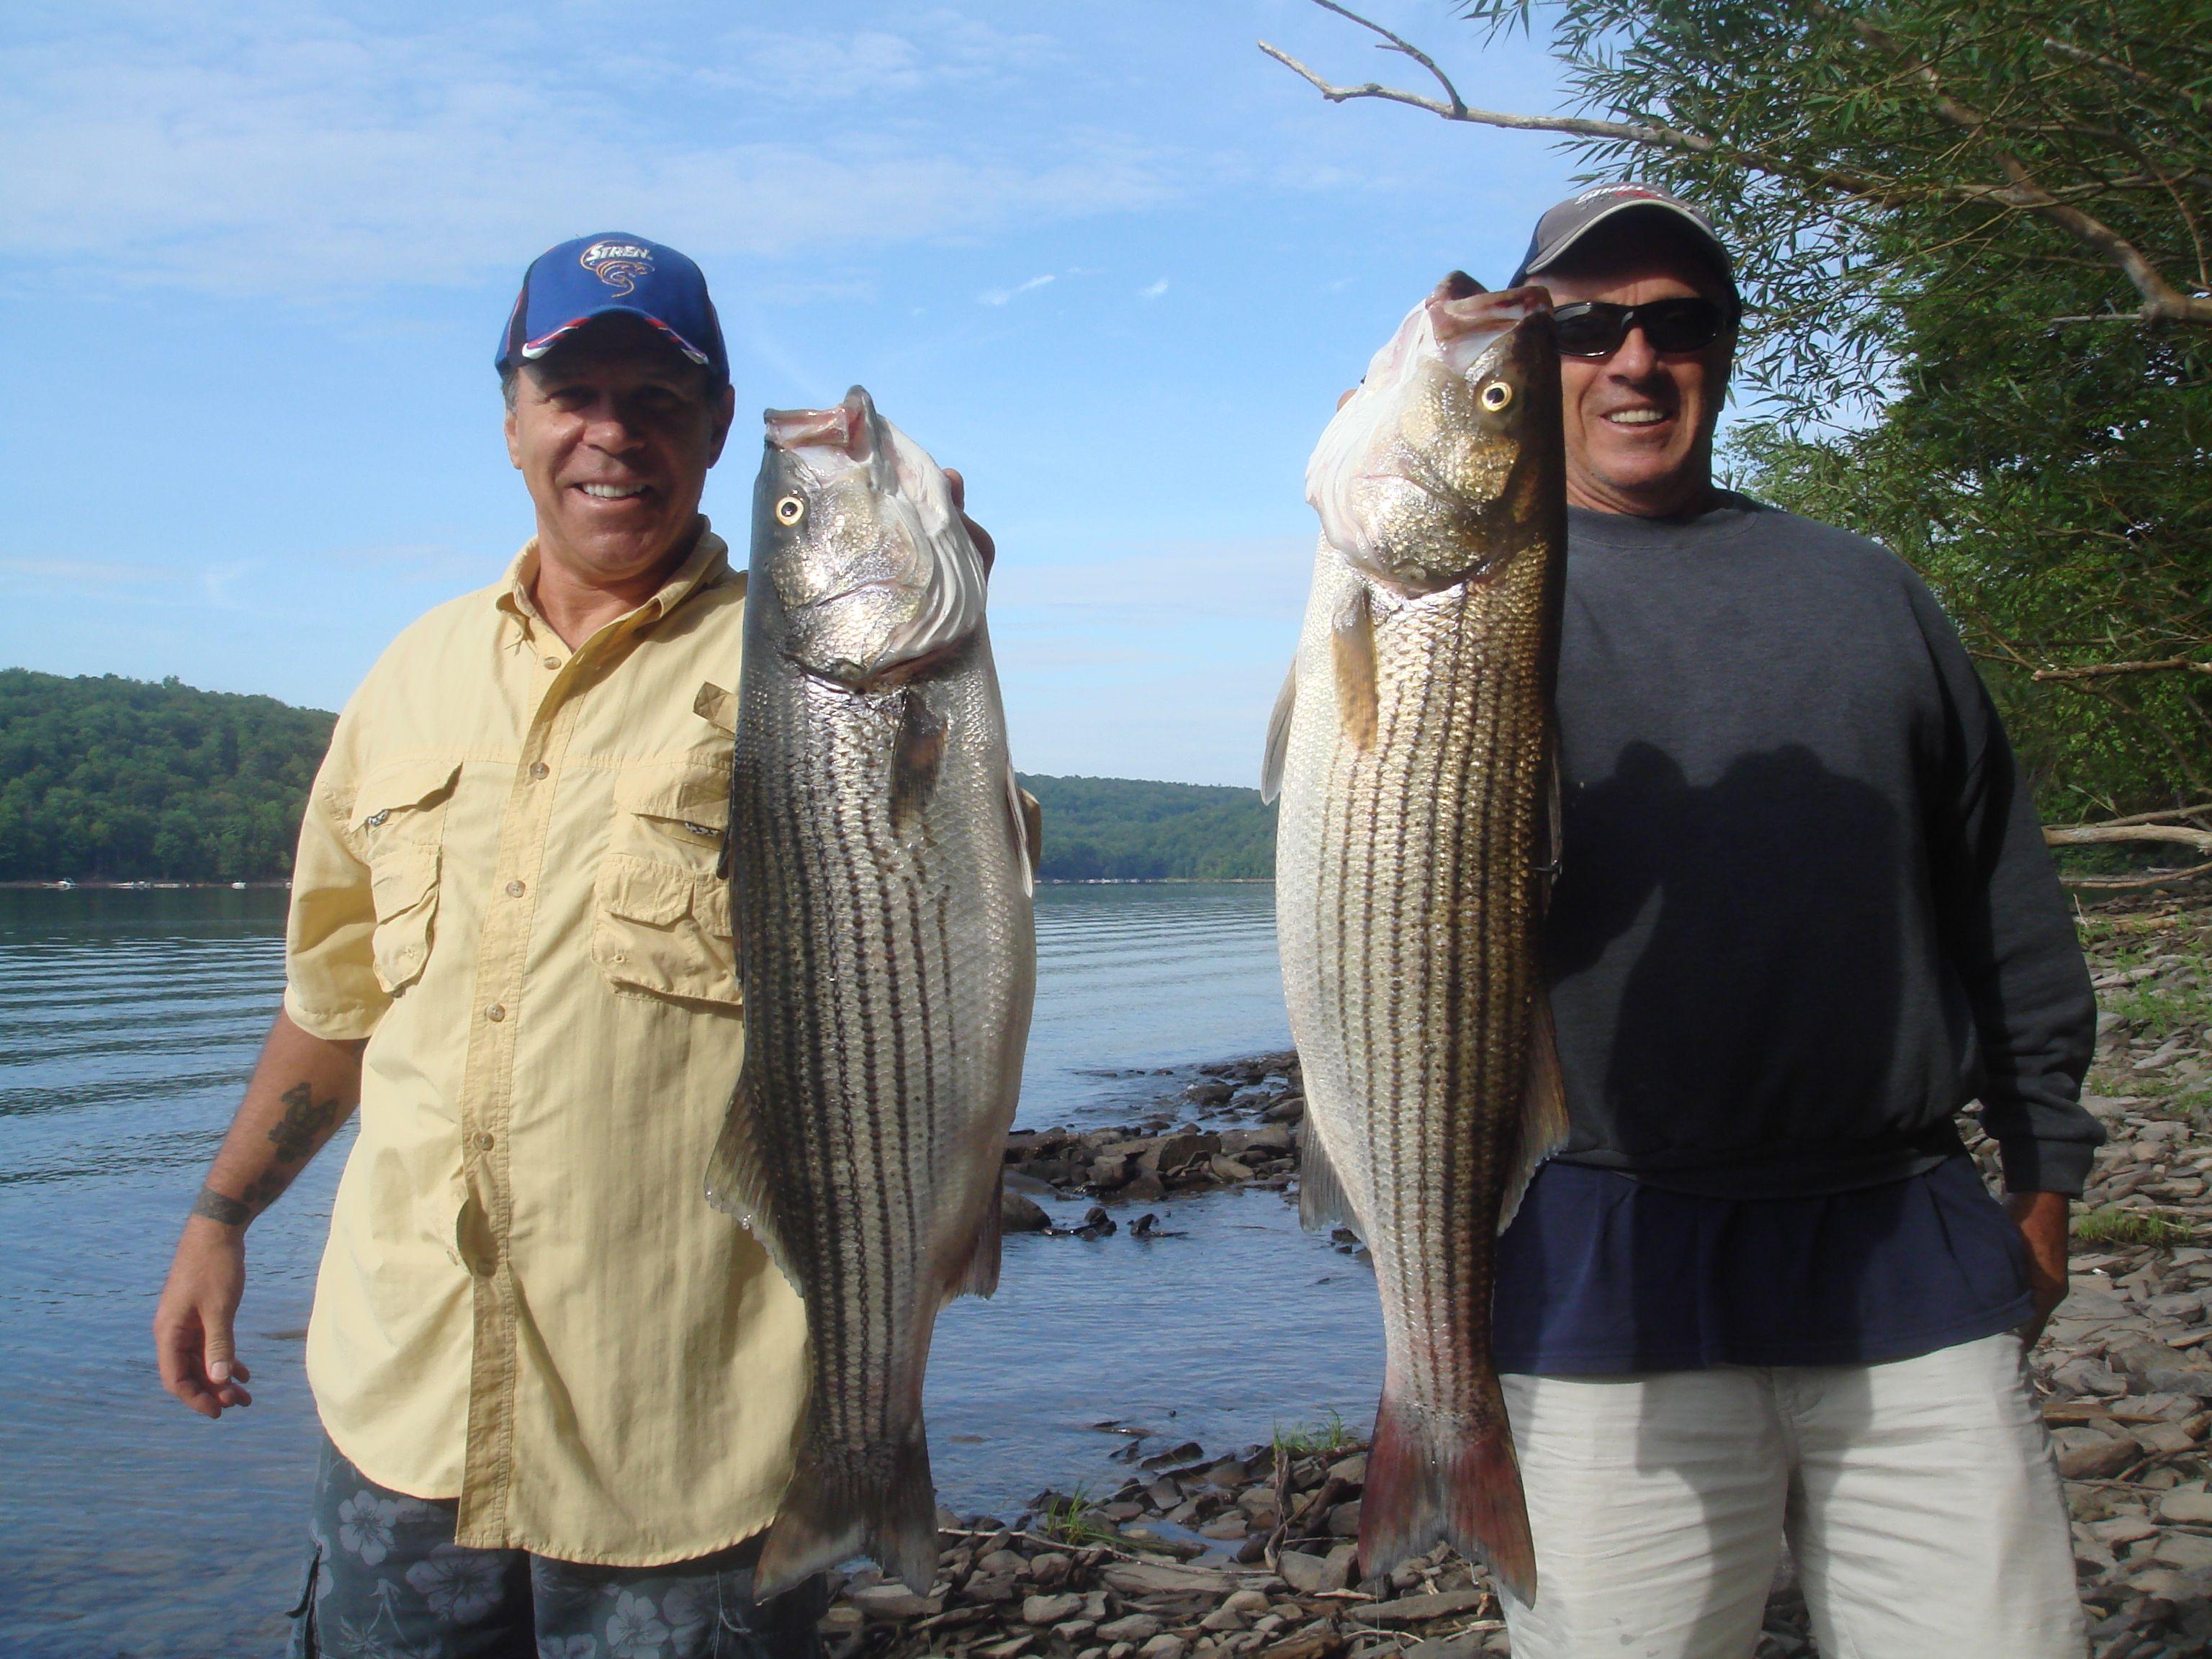 Lake wallenpaupack summer stripers legends outdoors for Lake wallenpaupack fishing